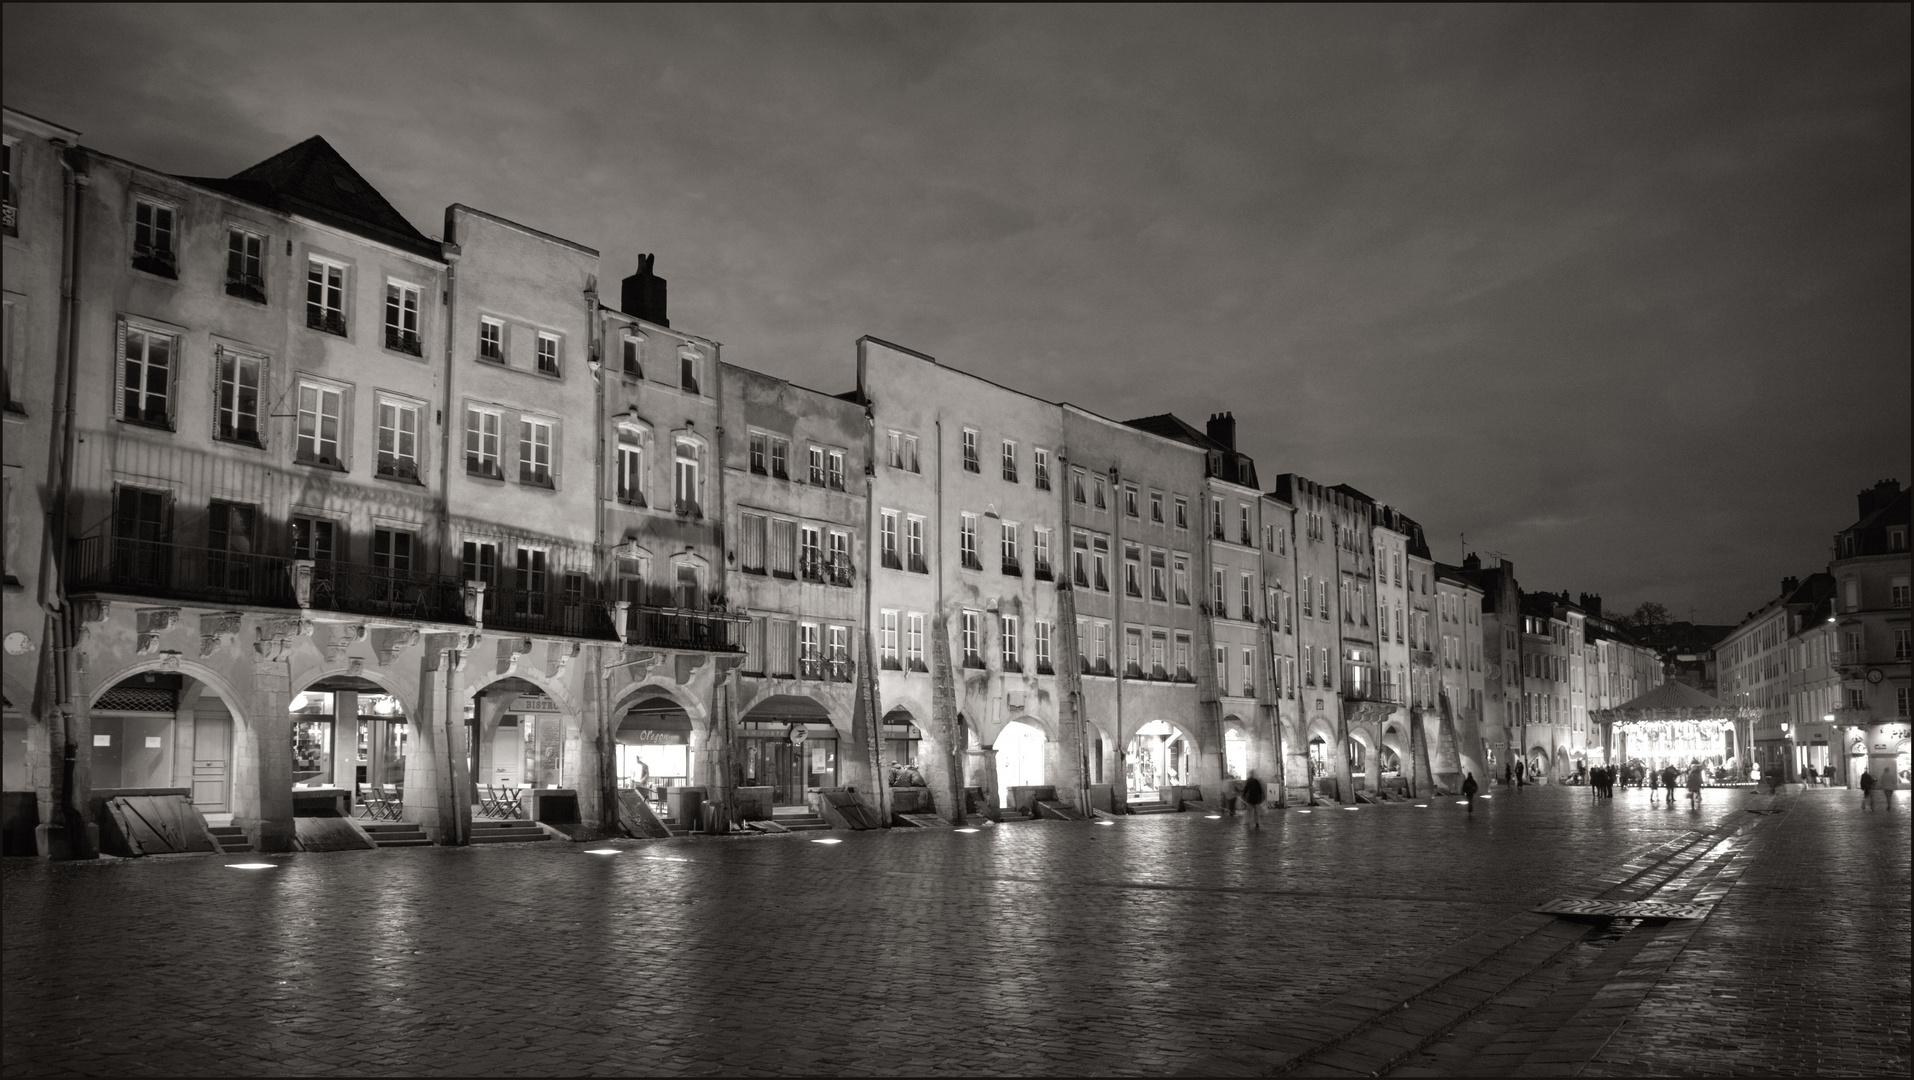 Place Saint Louis in Metz